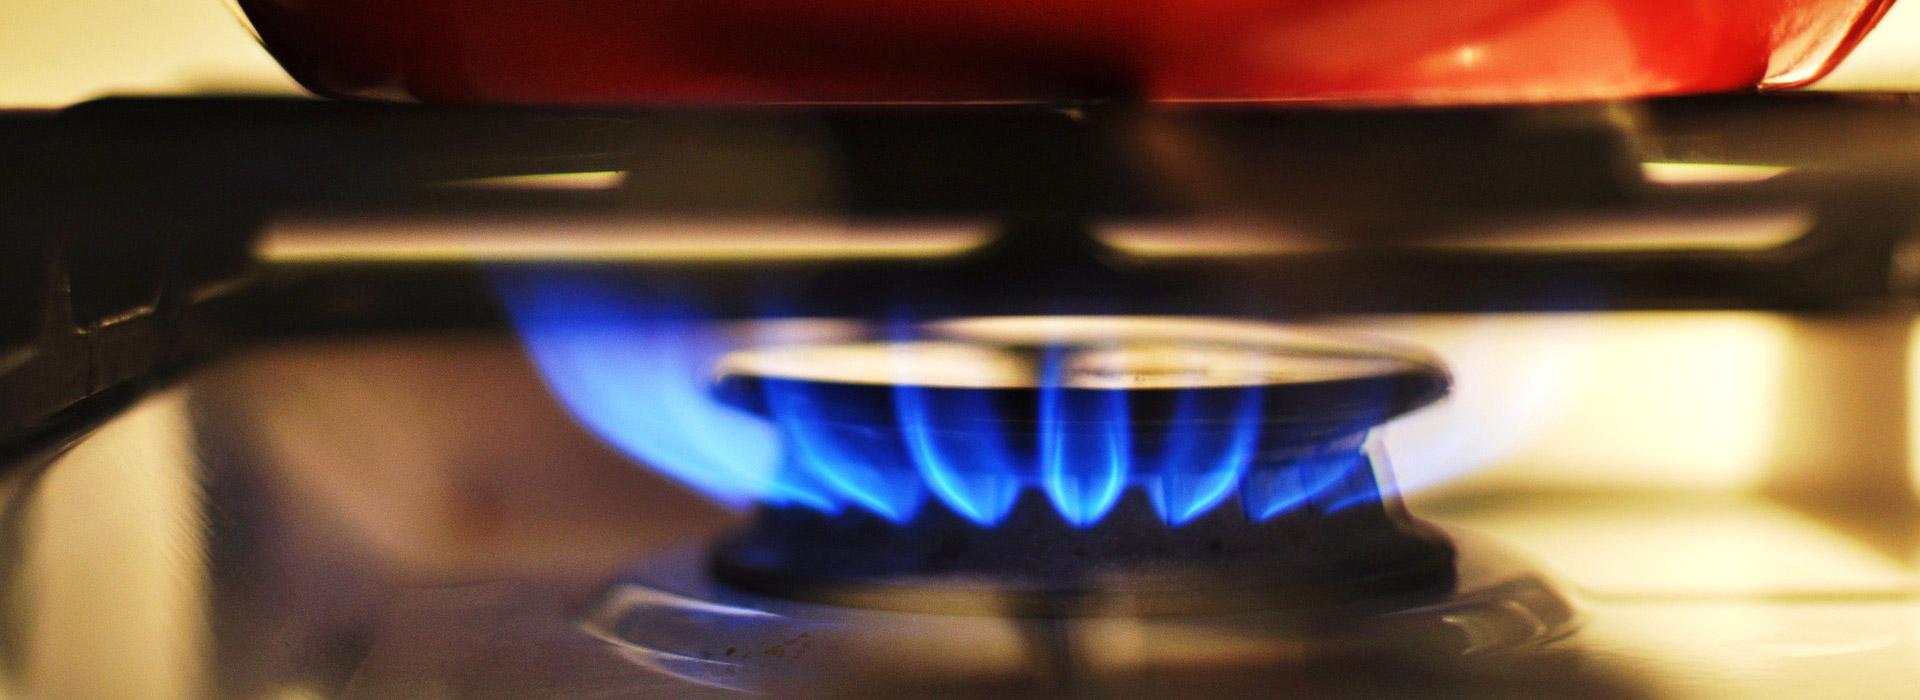 Proiectare si executie extindere retea gaze naturale